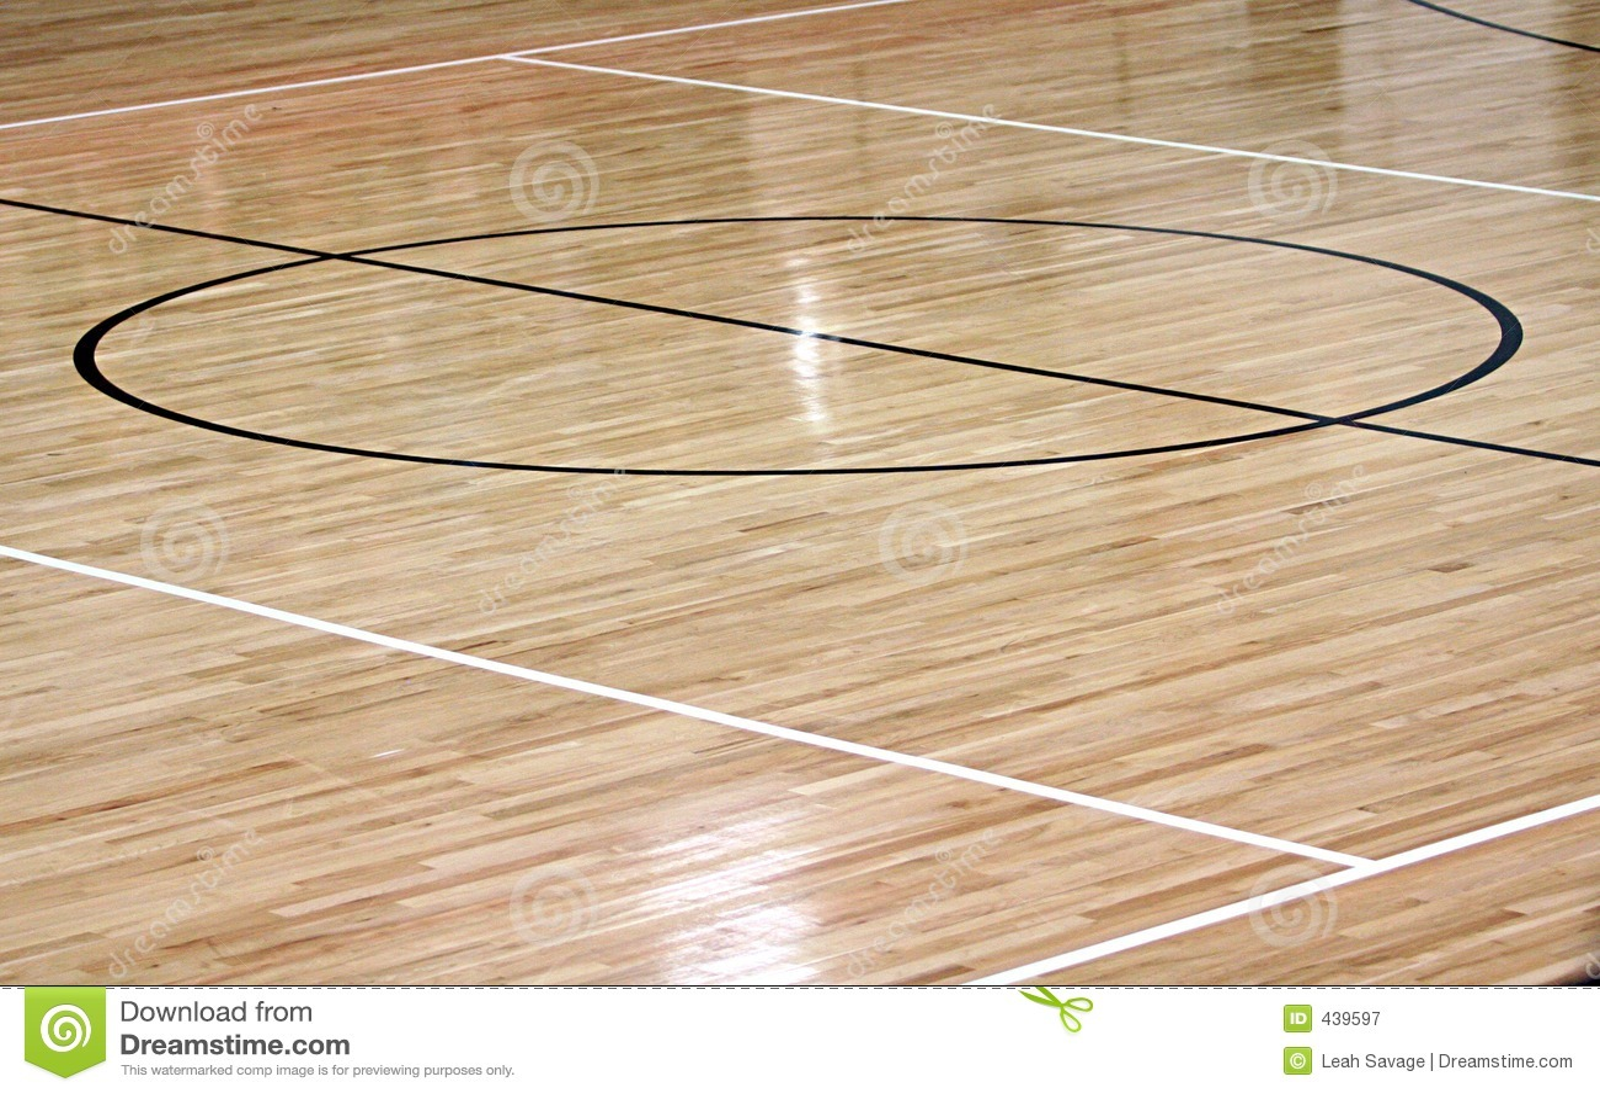 Corte Center do basquetebol